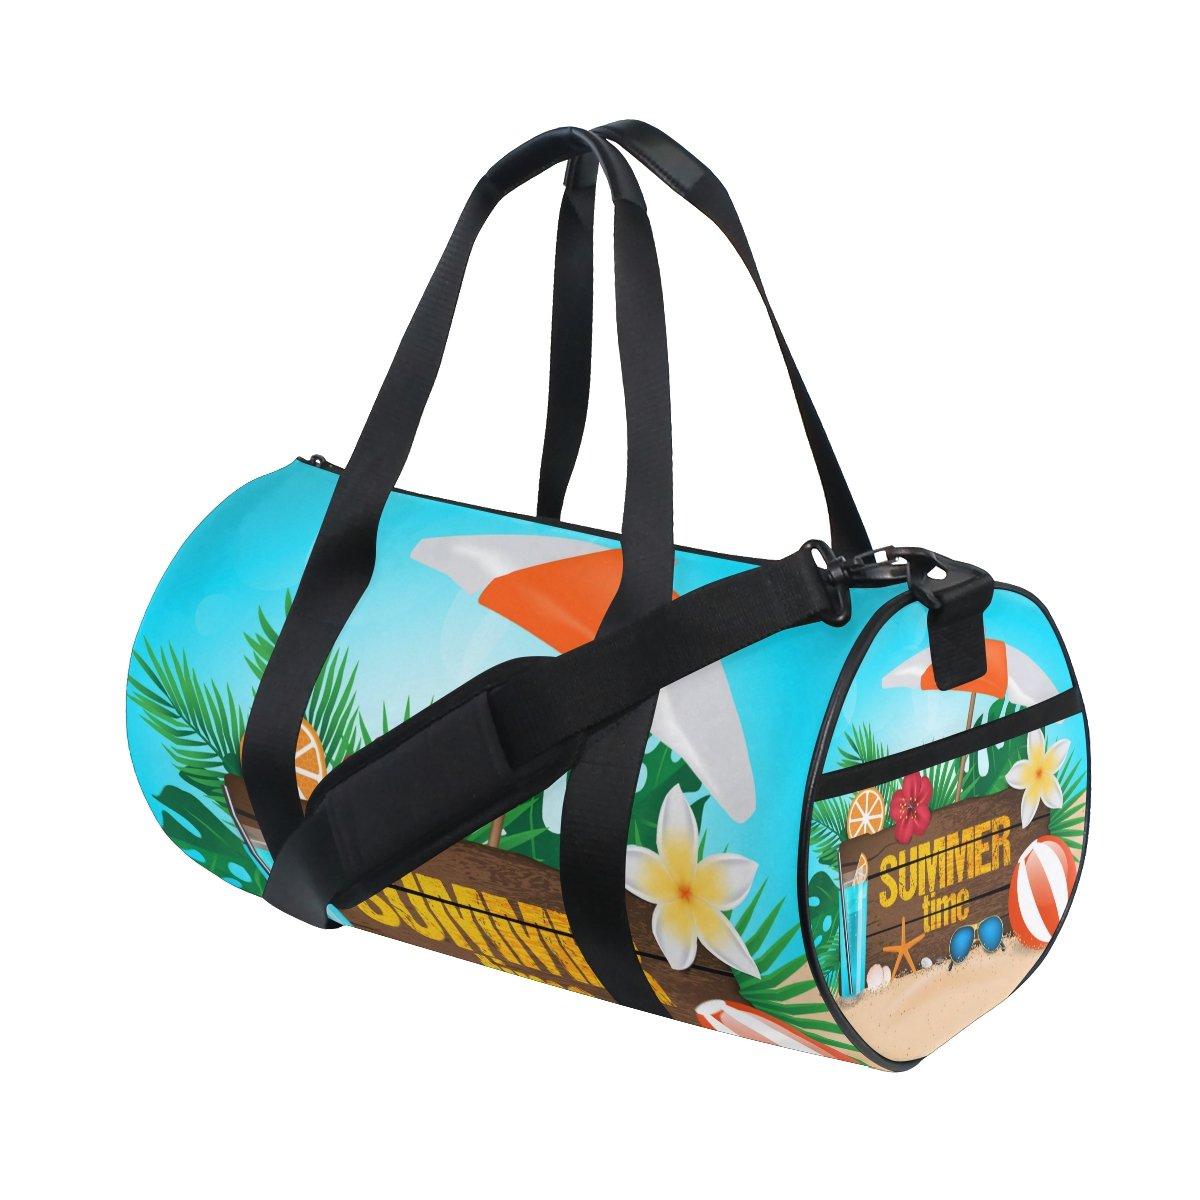 U LIFE Hello Welcome Summer Tropical Ocean Sea Beach Sports Gym Shoulder Handy Duffel Bags for Women Men Kids Boys Girls